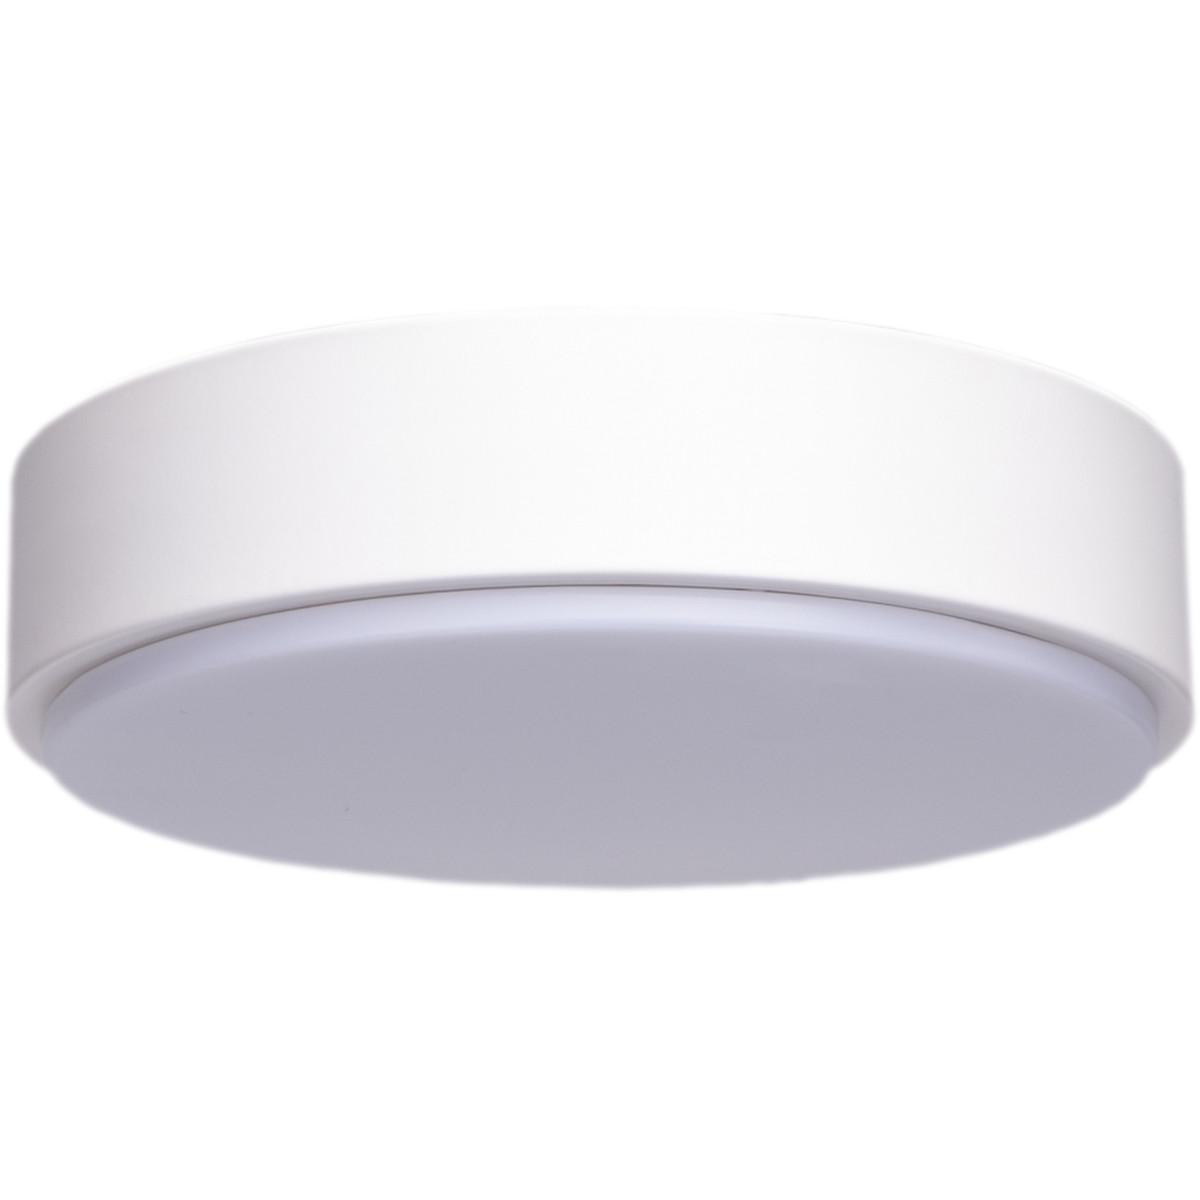 LED Plafondlamp - Aigi Santi - Opbouw Rond 12W - Natuurlijk Wit 4000K - Mat Wit Aluminium